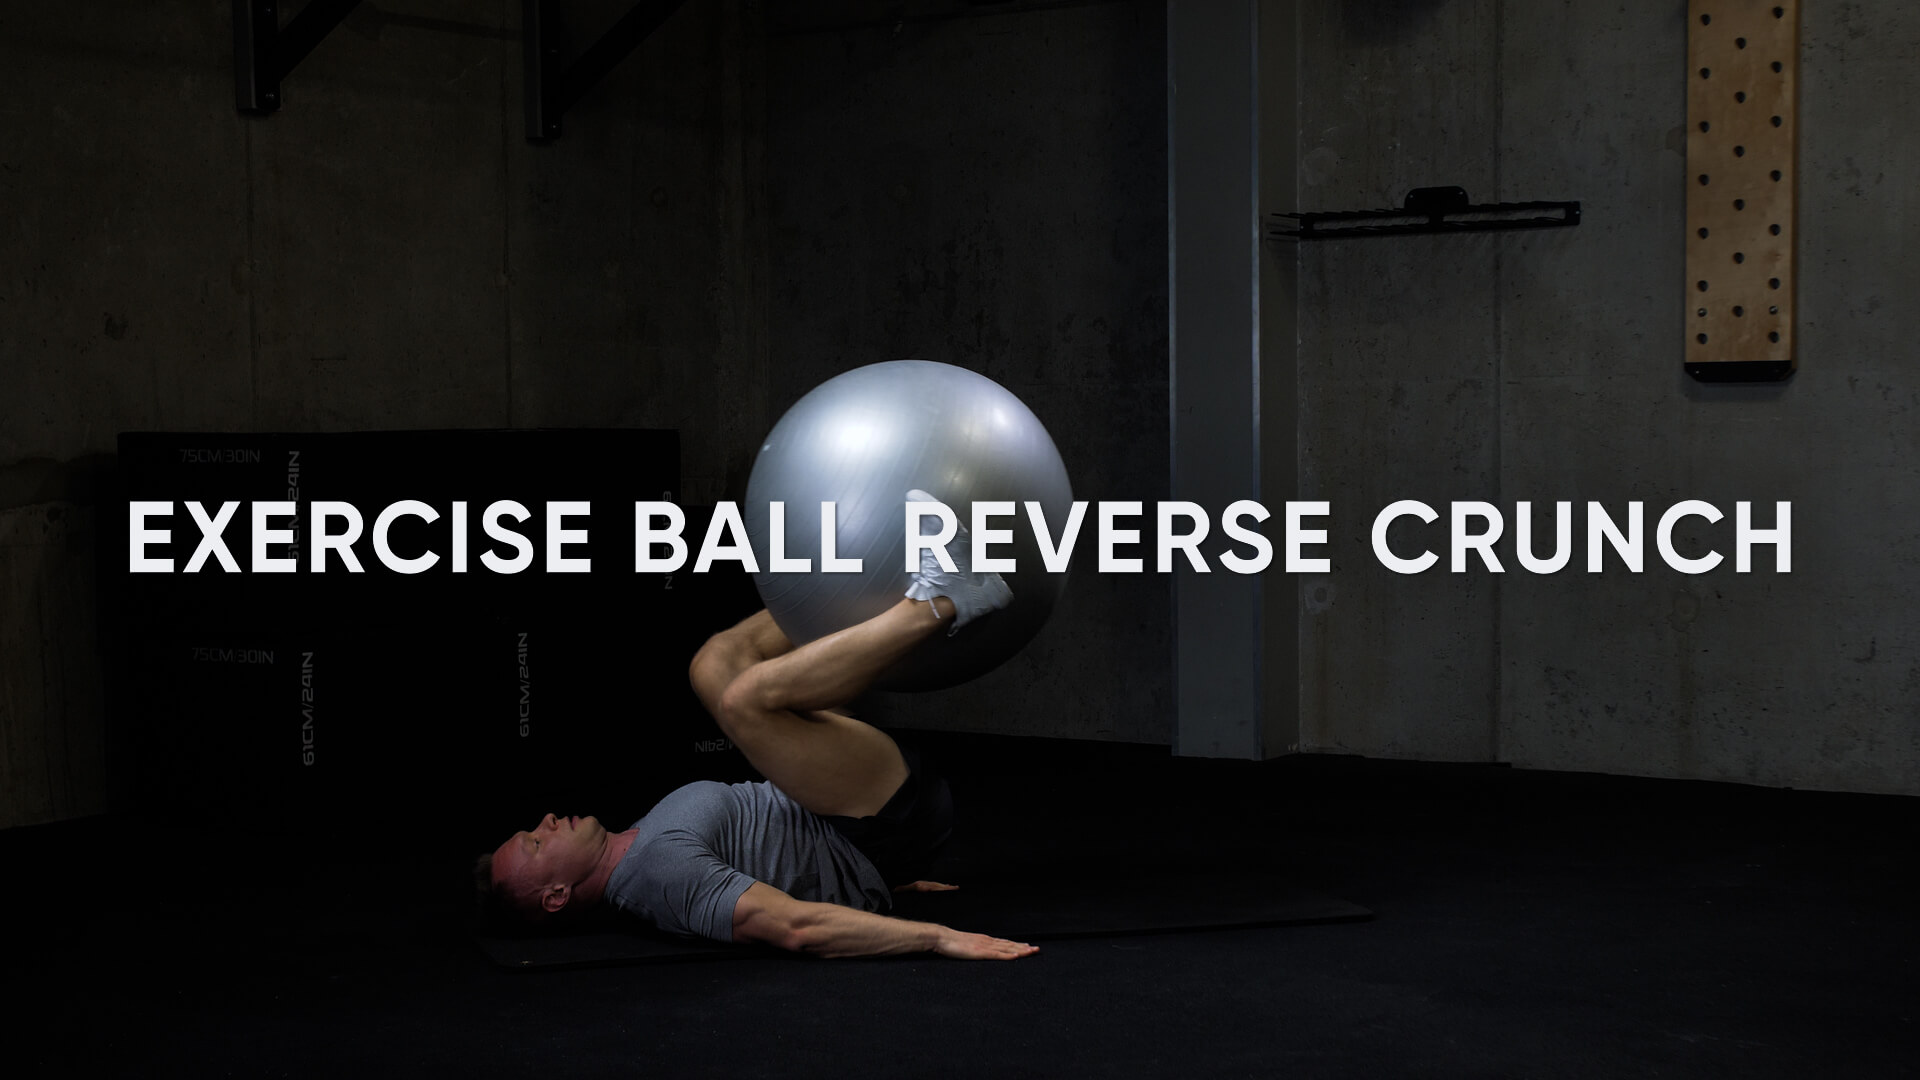 Exercise Ball Reverse Crunch